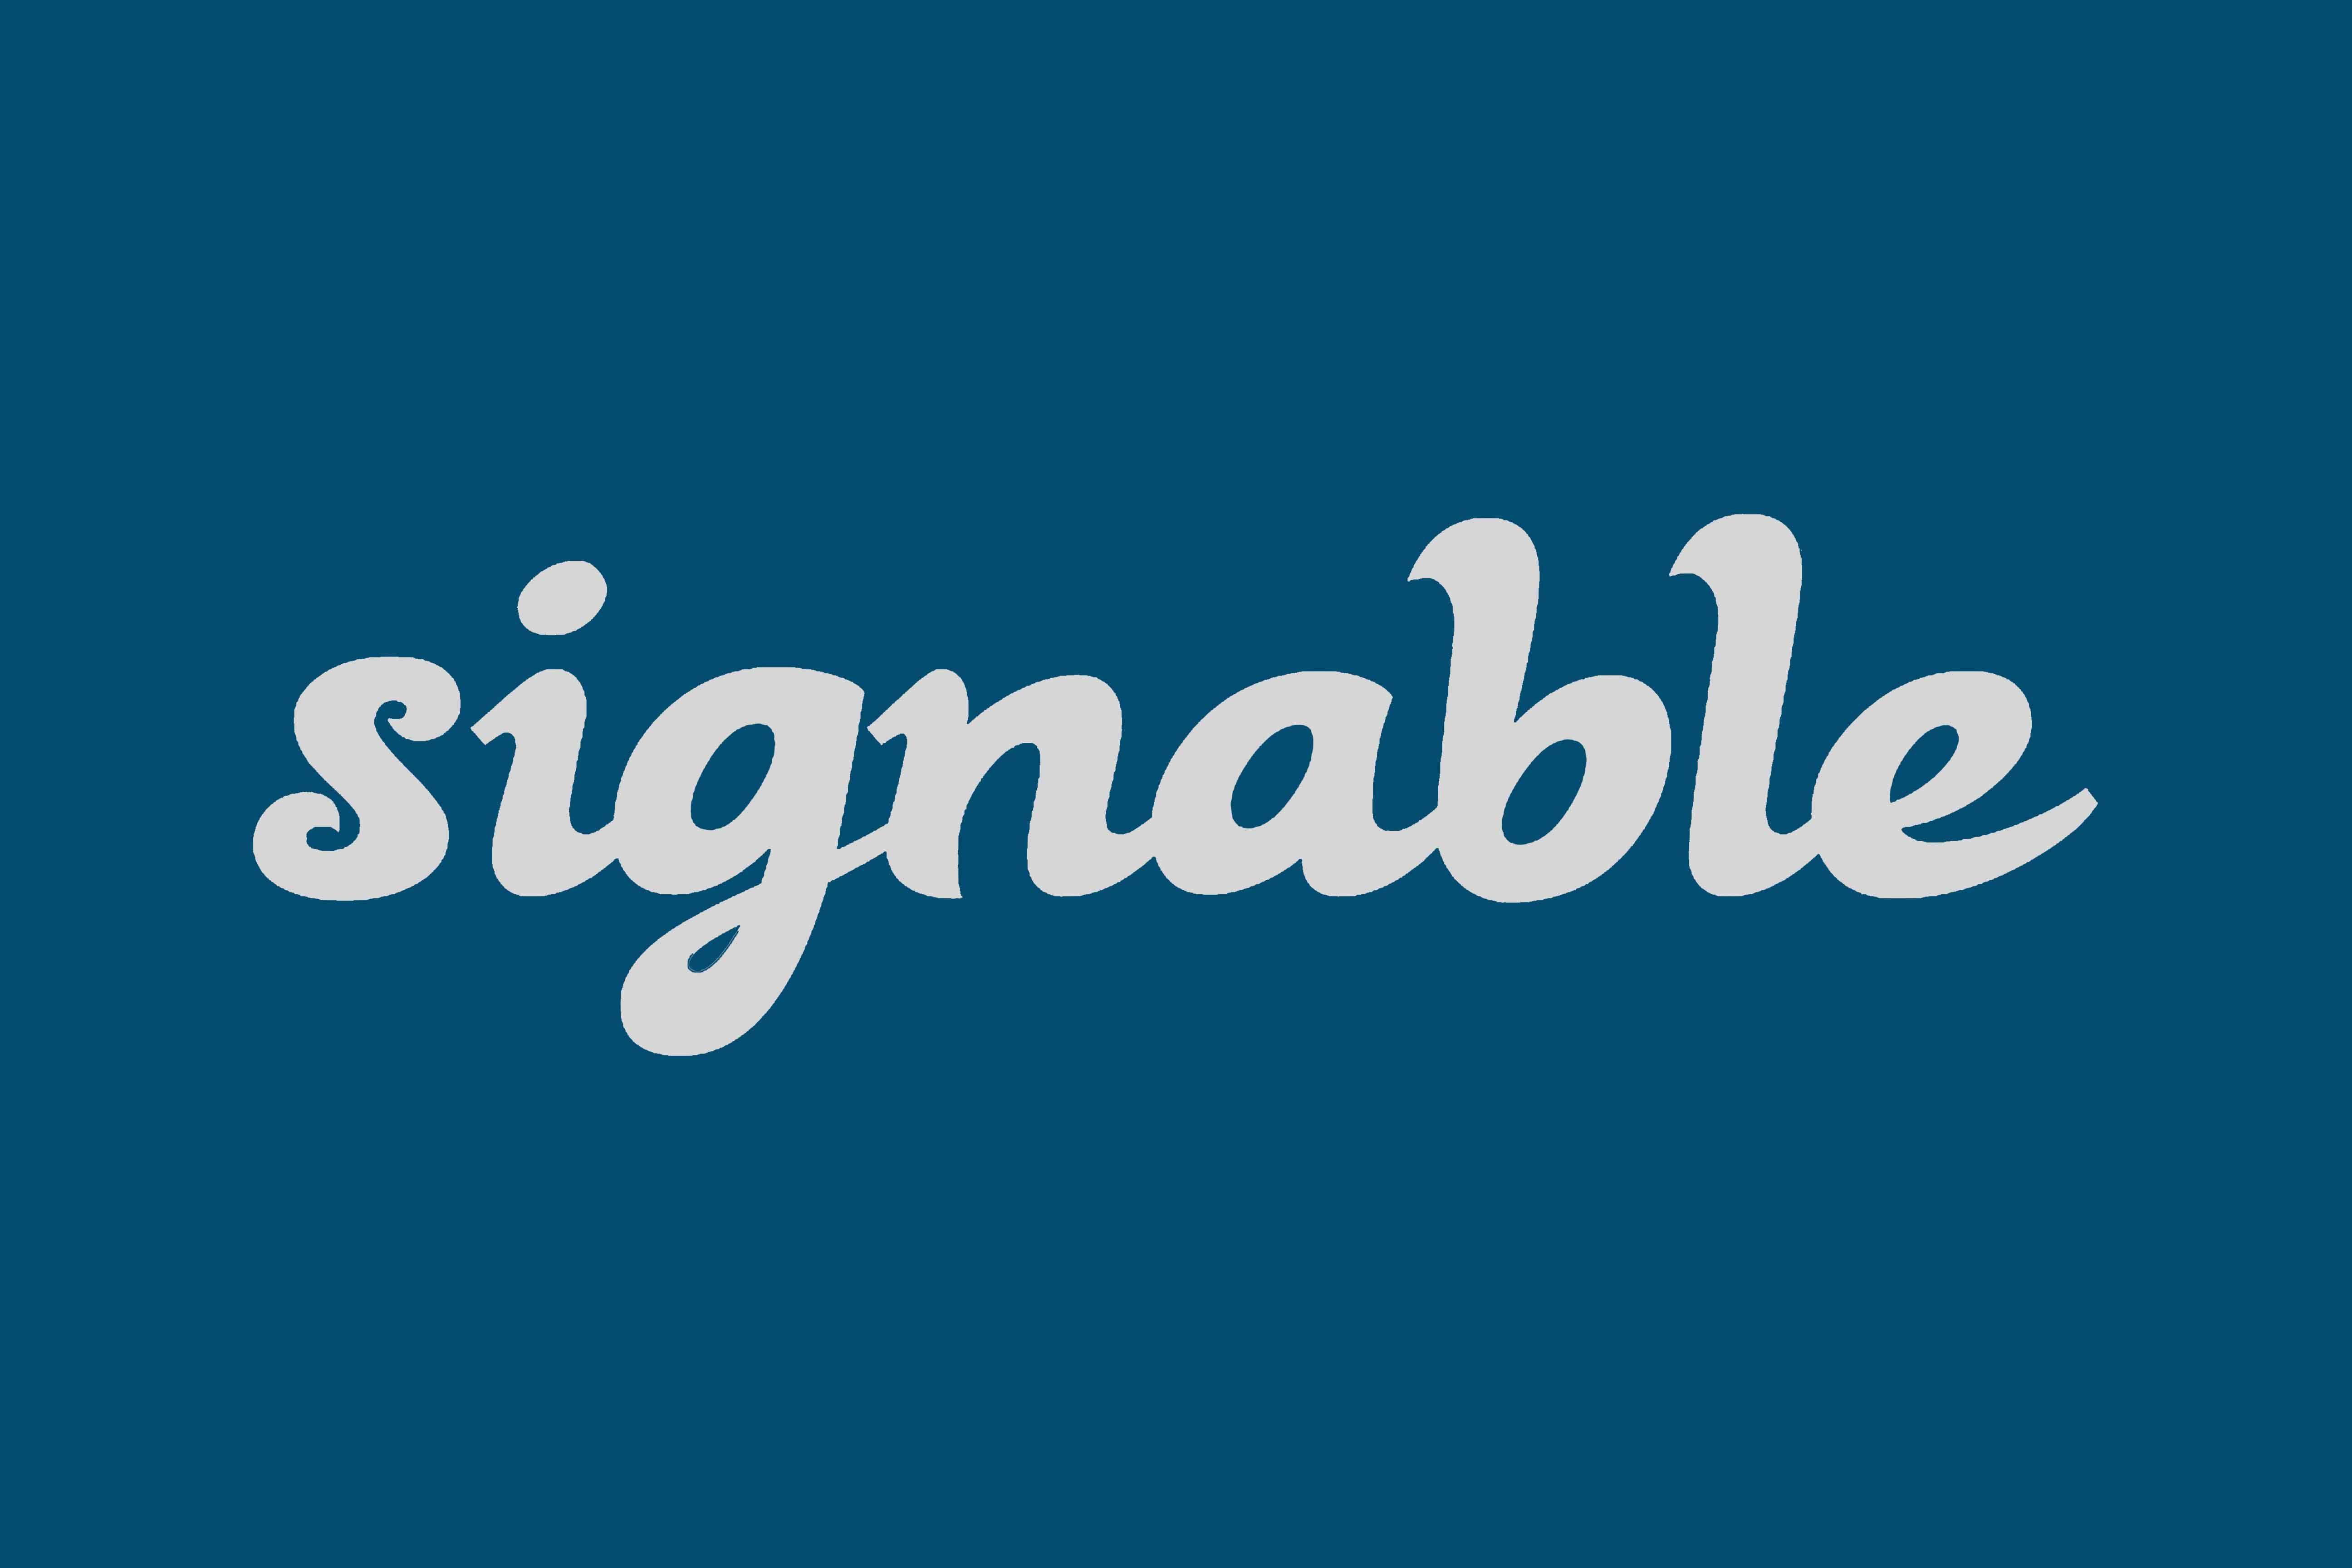 Signable